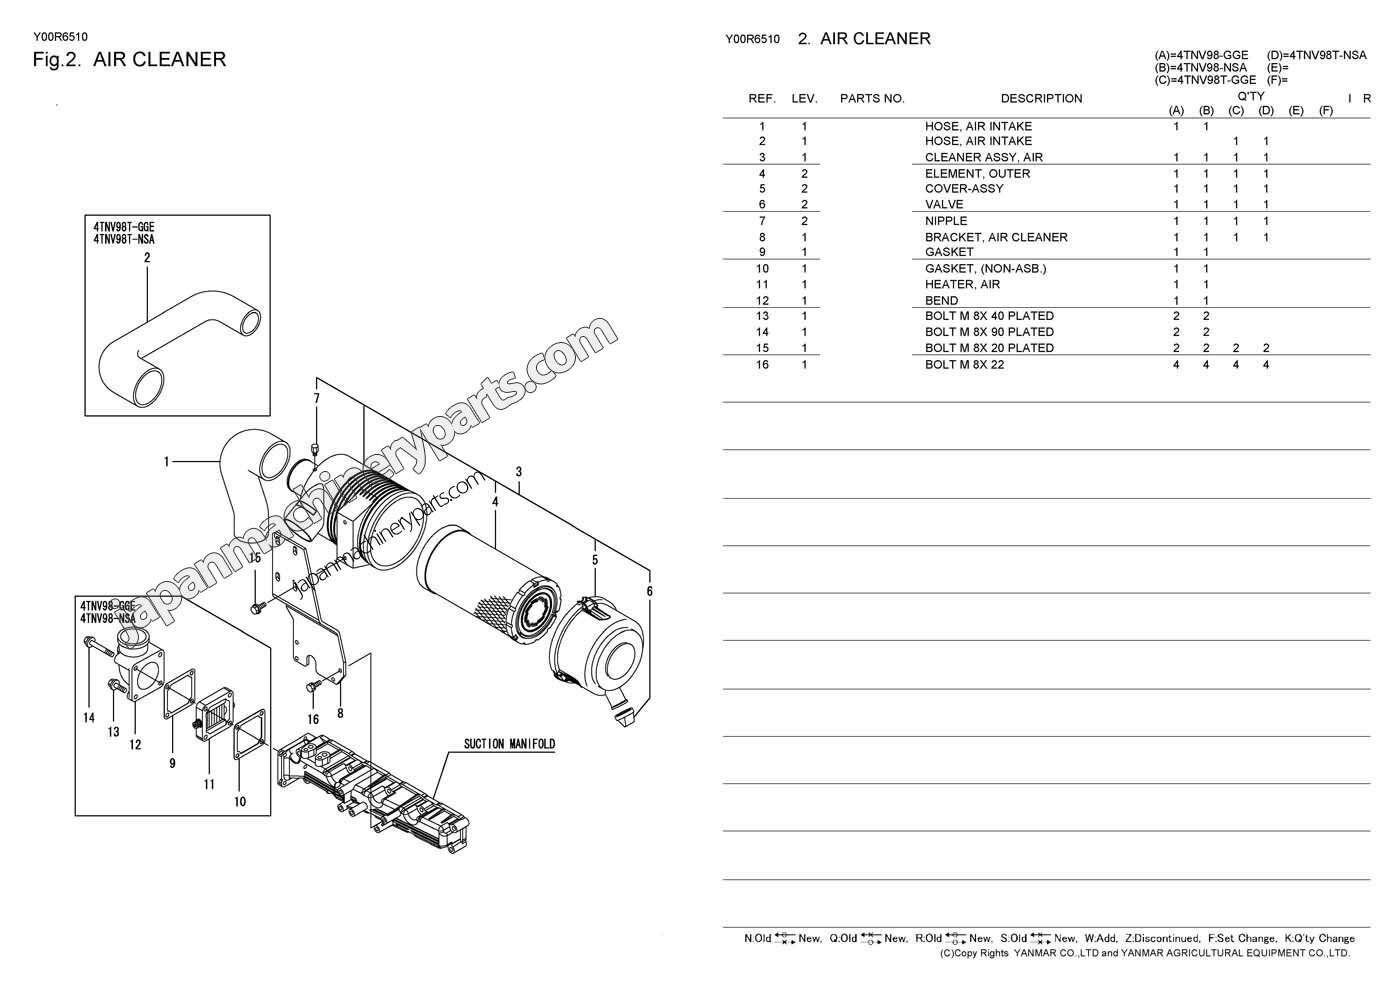 parts for yanmar 4tnv98 nsa nsa2 gge rh japanmachineryparts com